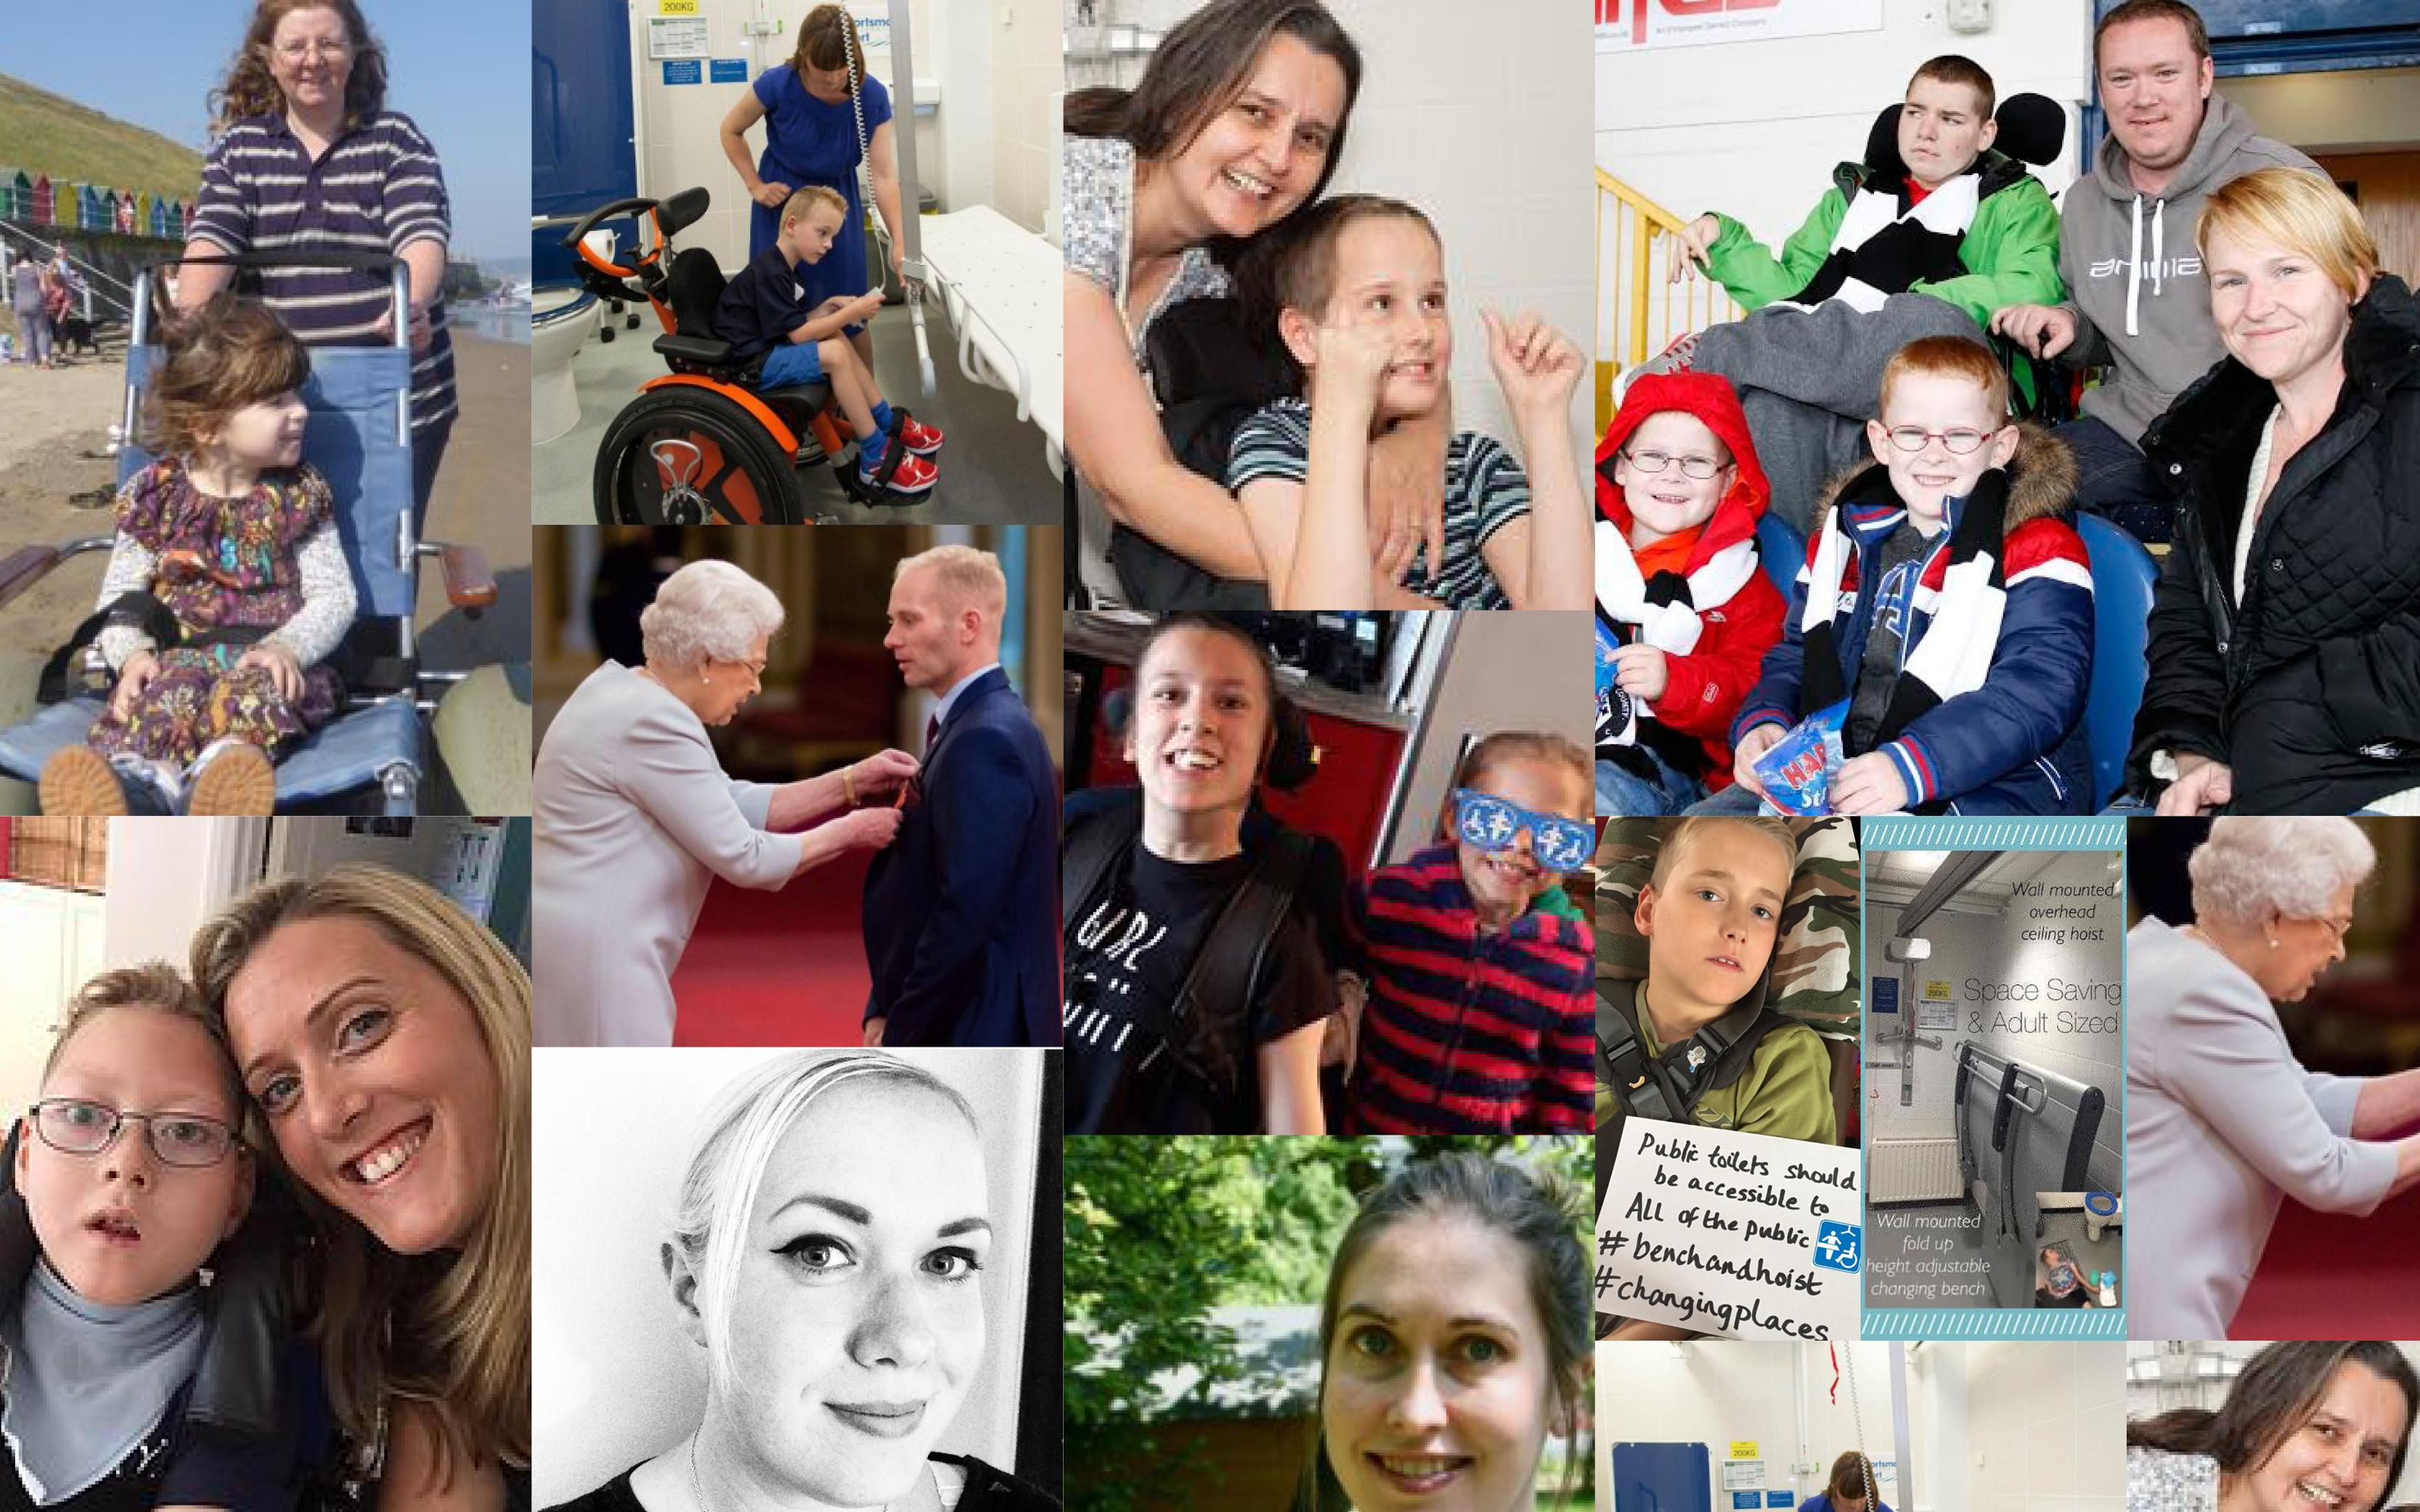 Accessible Toilet Campaigners: 10 Famous Faces